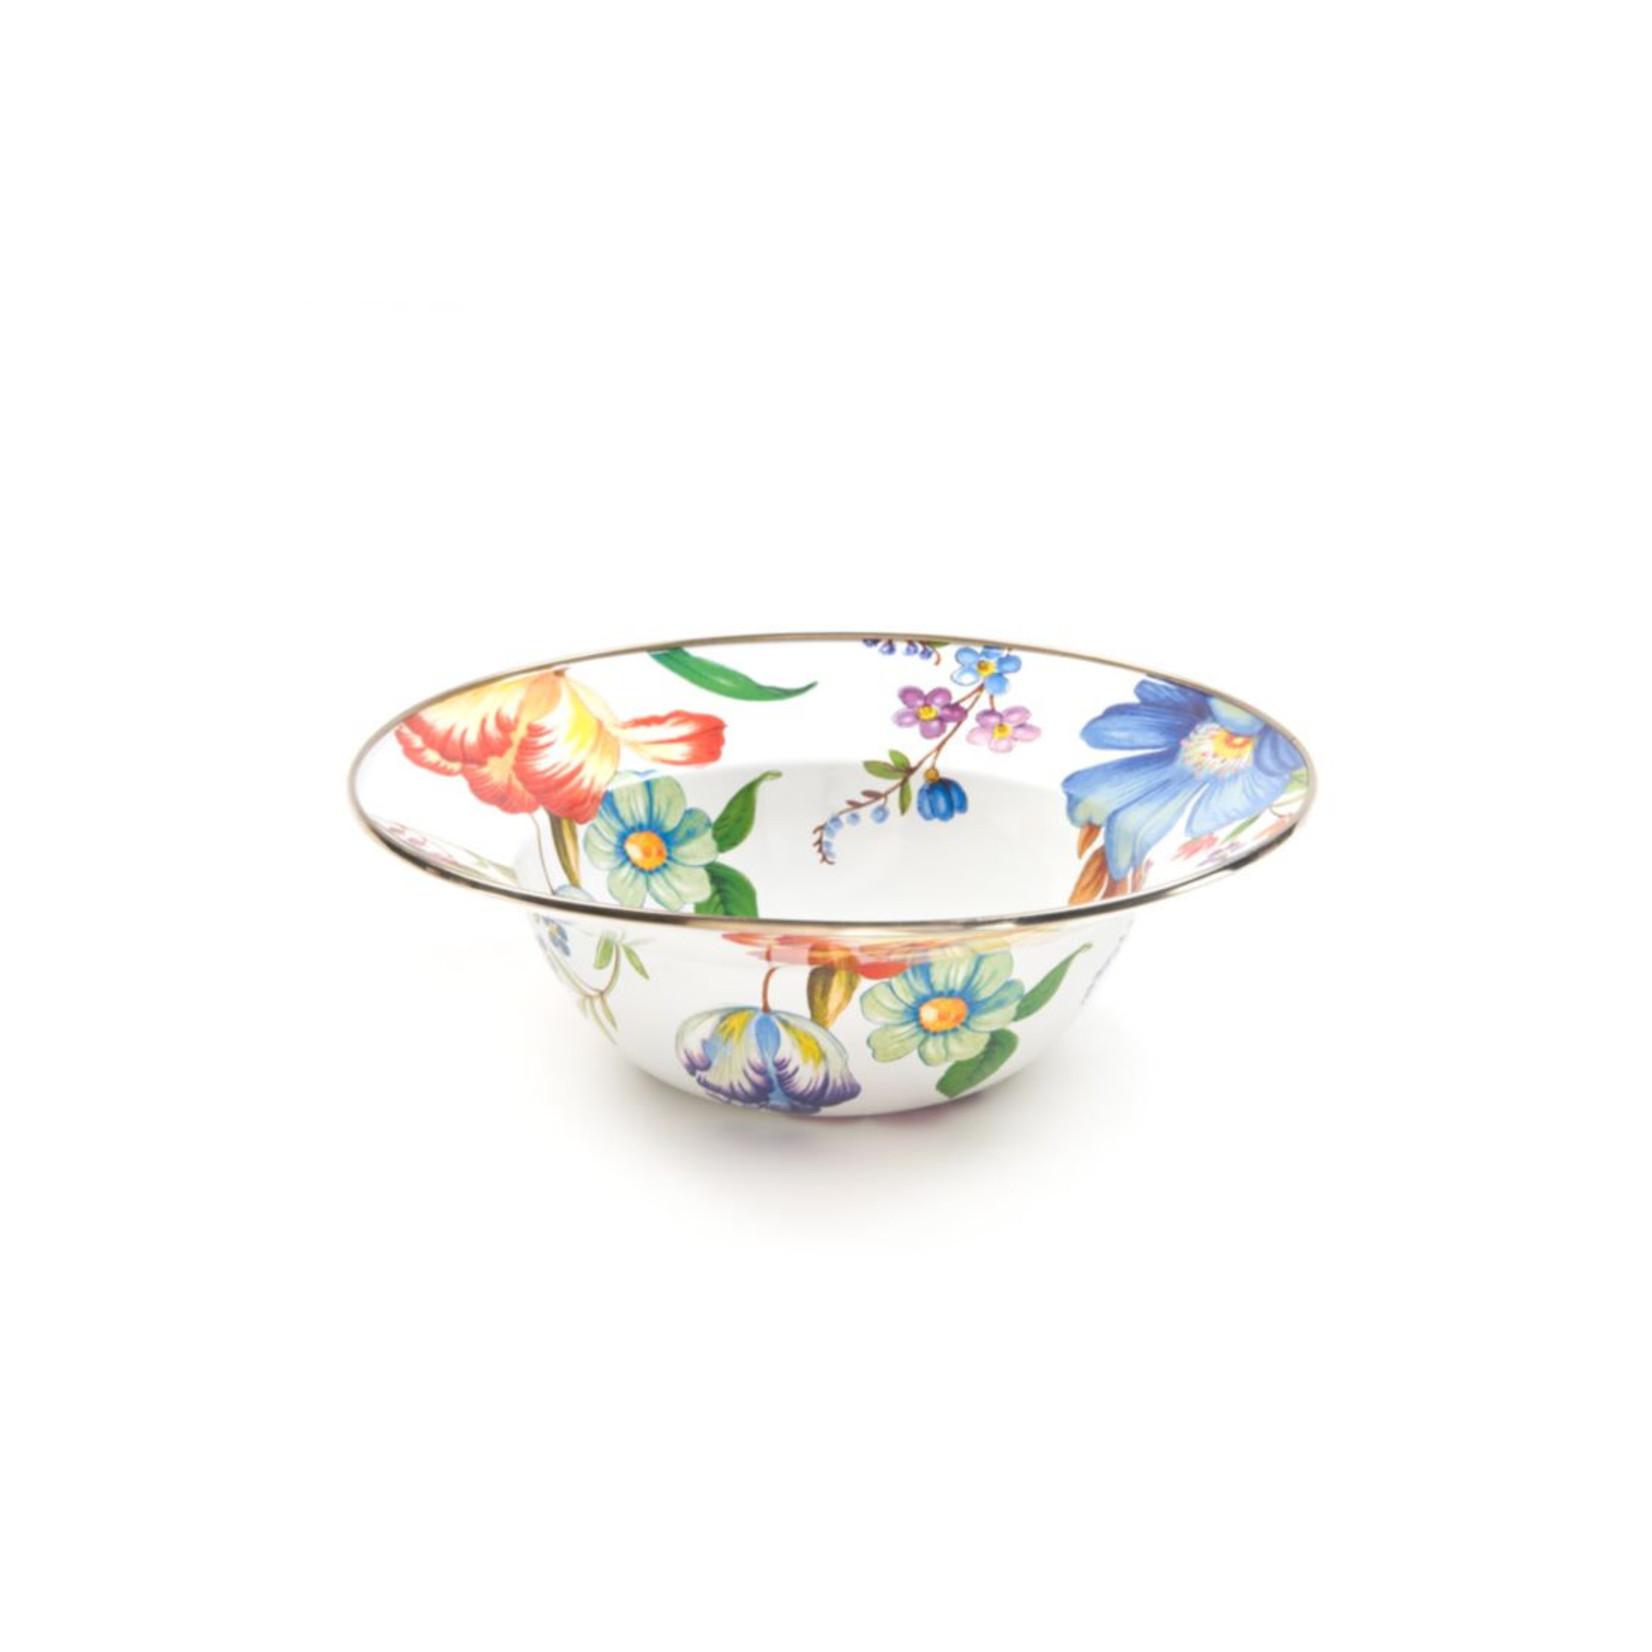 MacKenzie Childs Flower Market serving bowl - white